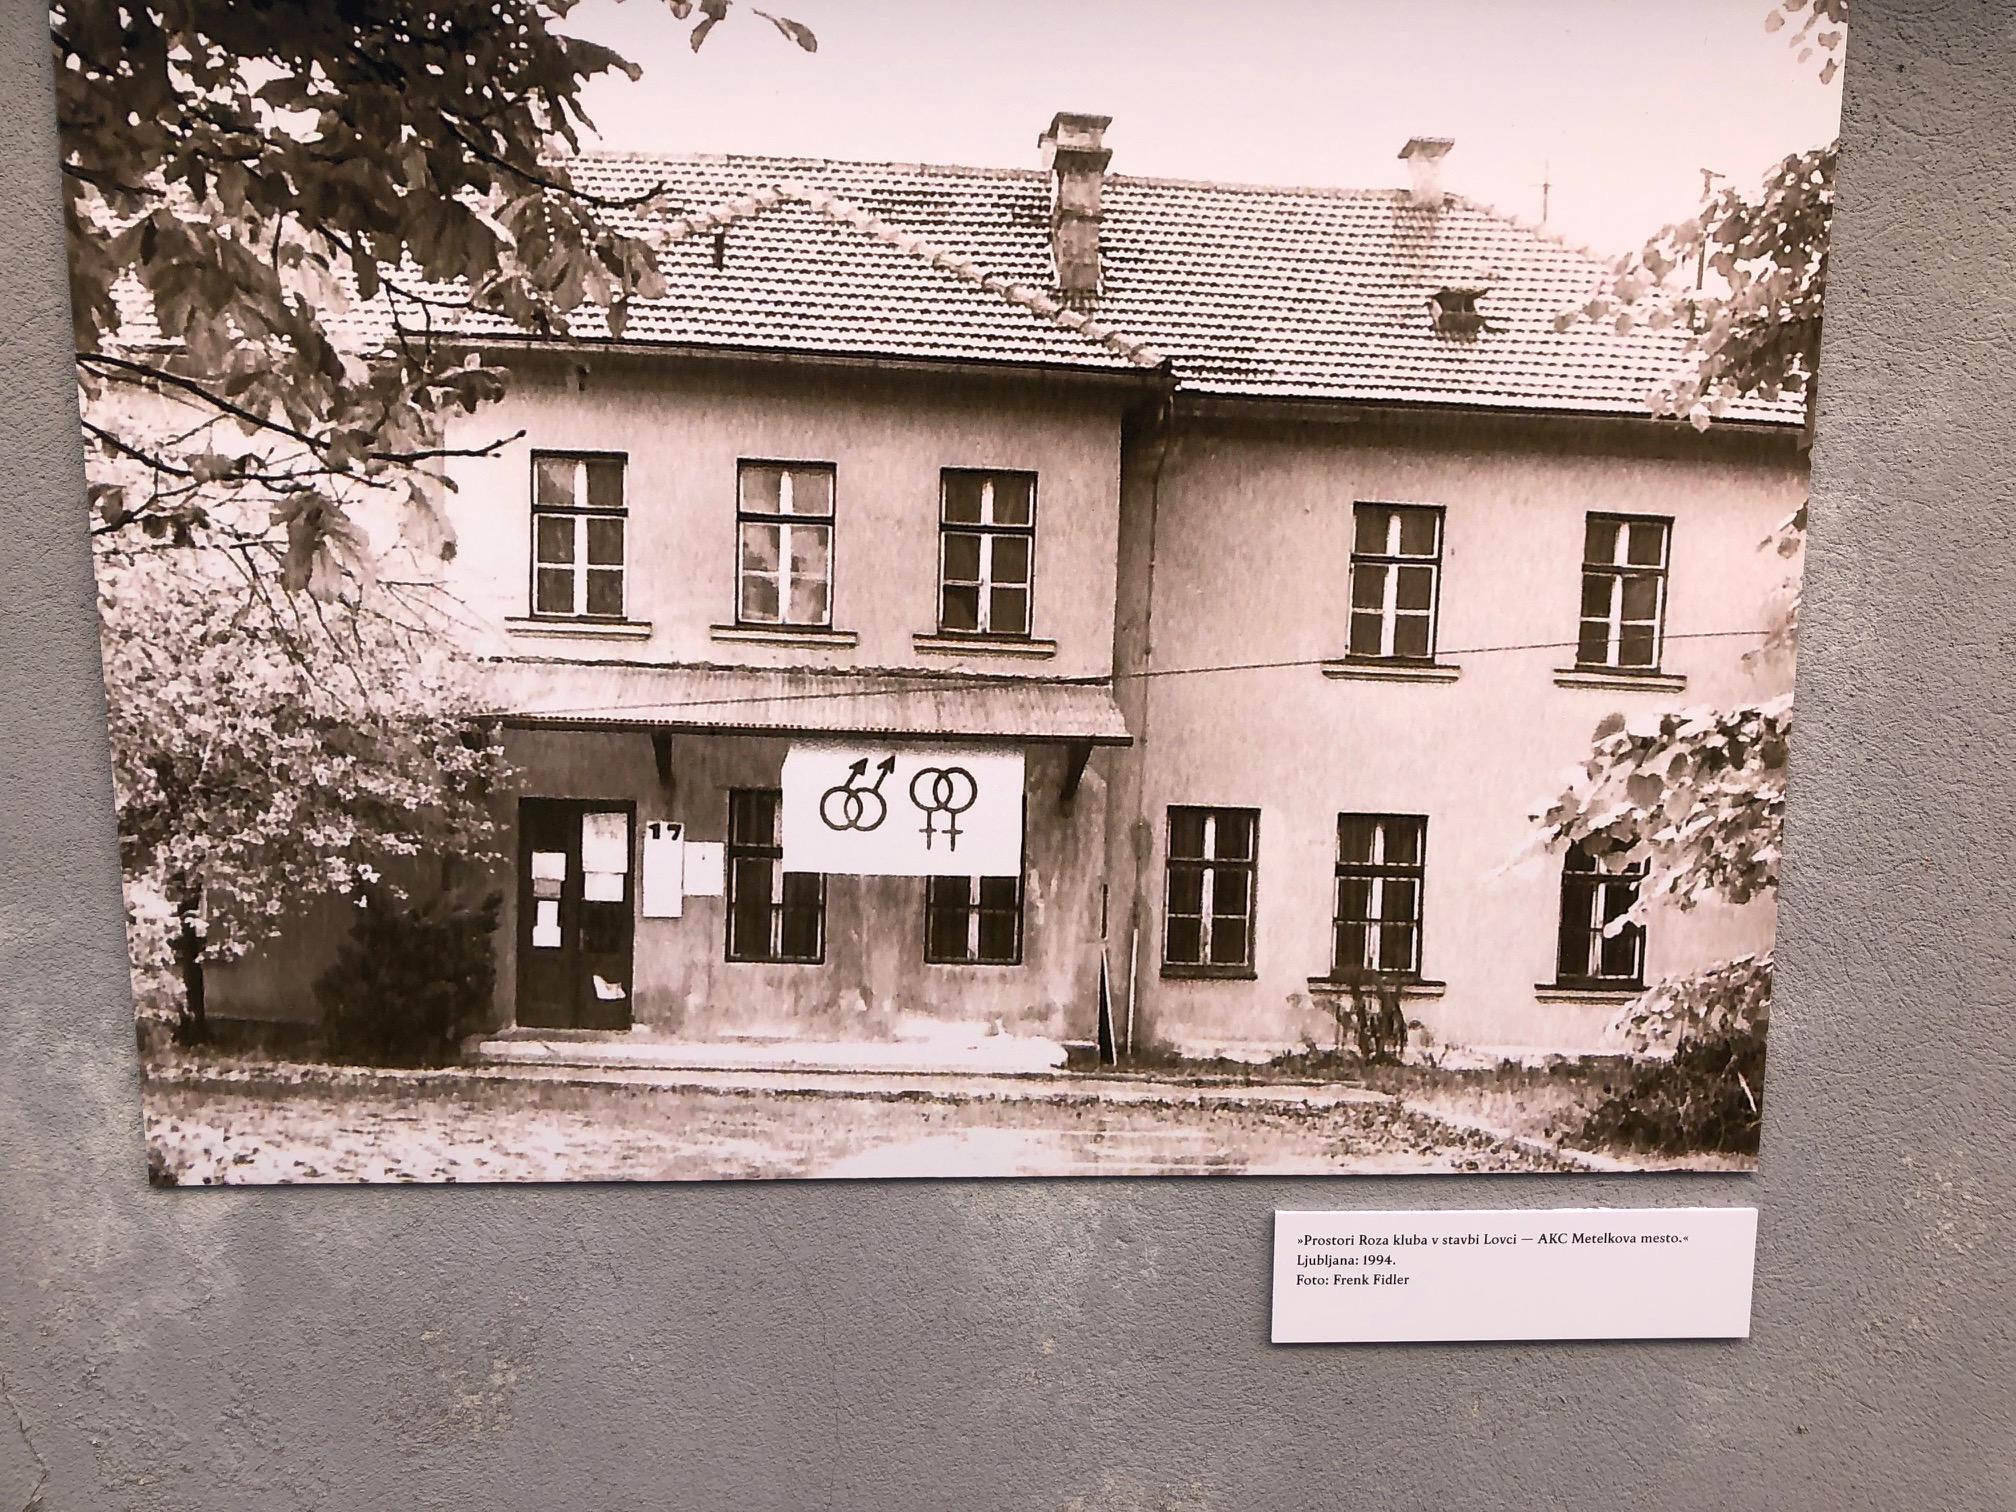 stavba Lovci 1994